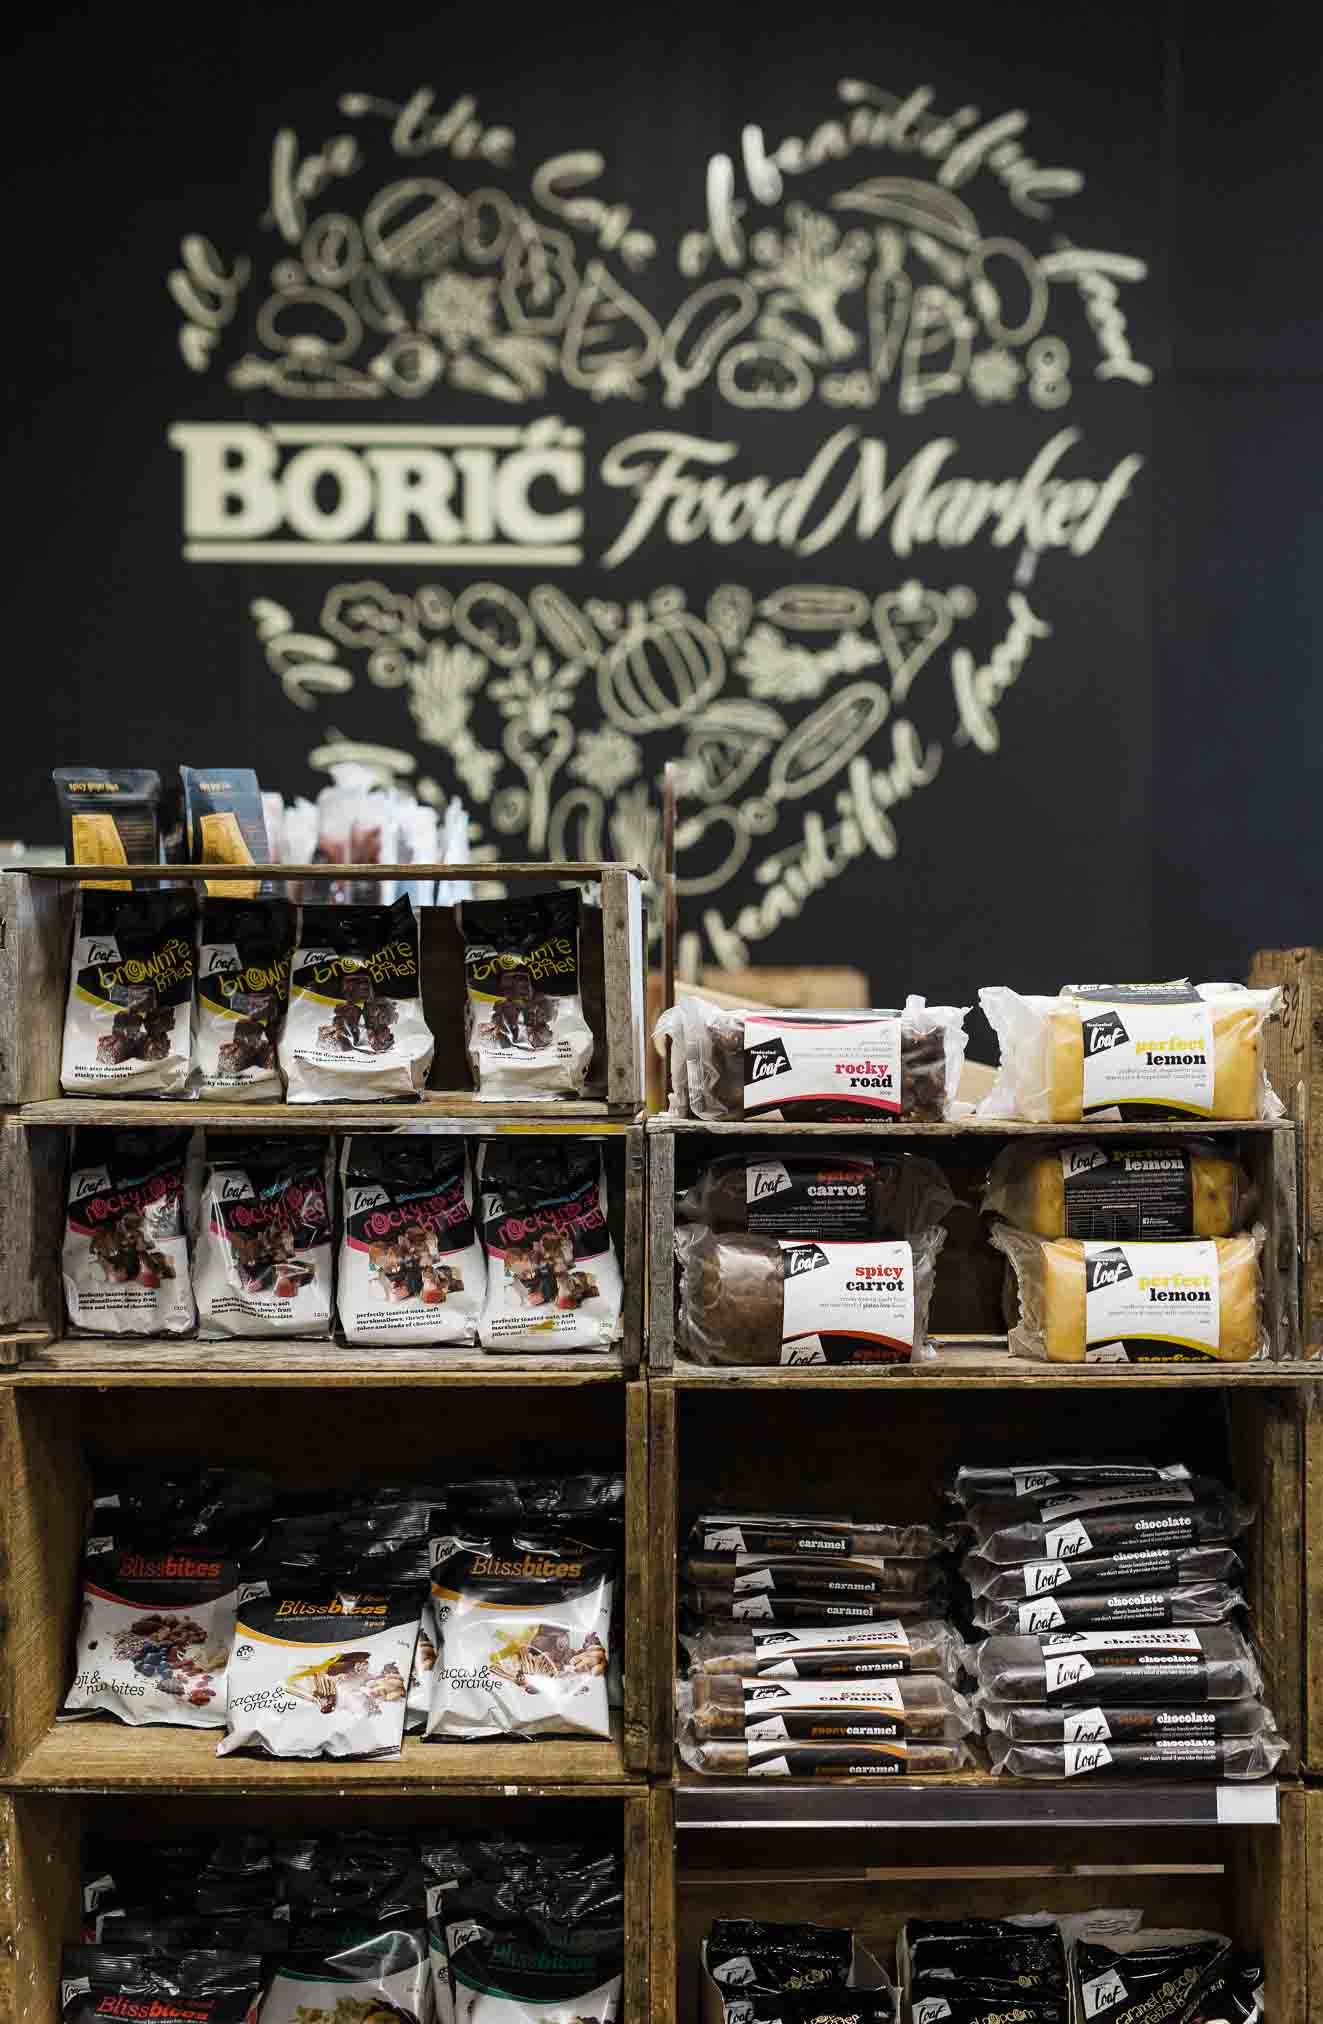 boric heart w products.jpg